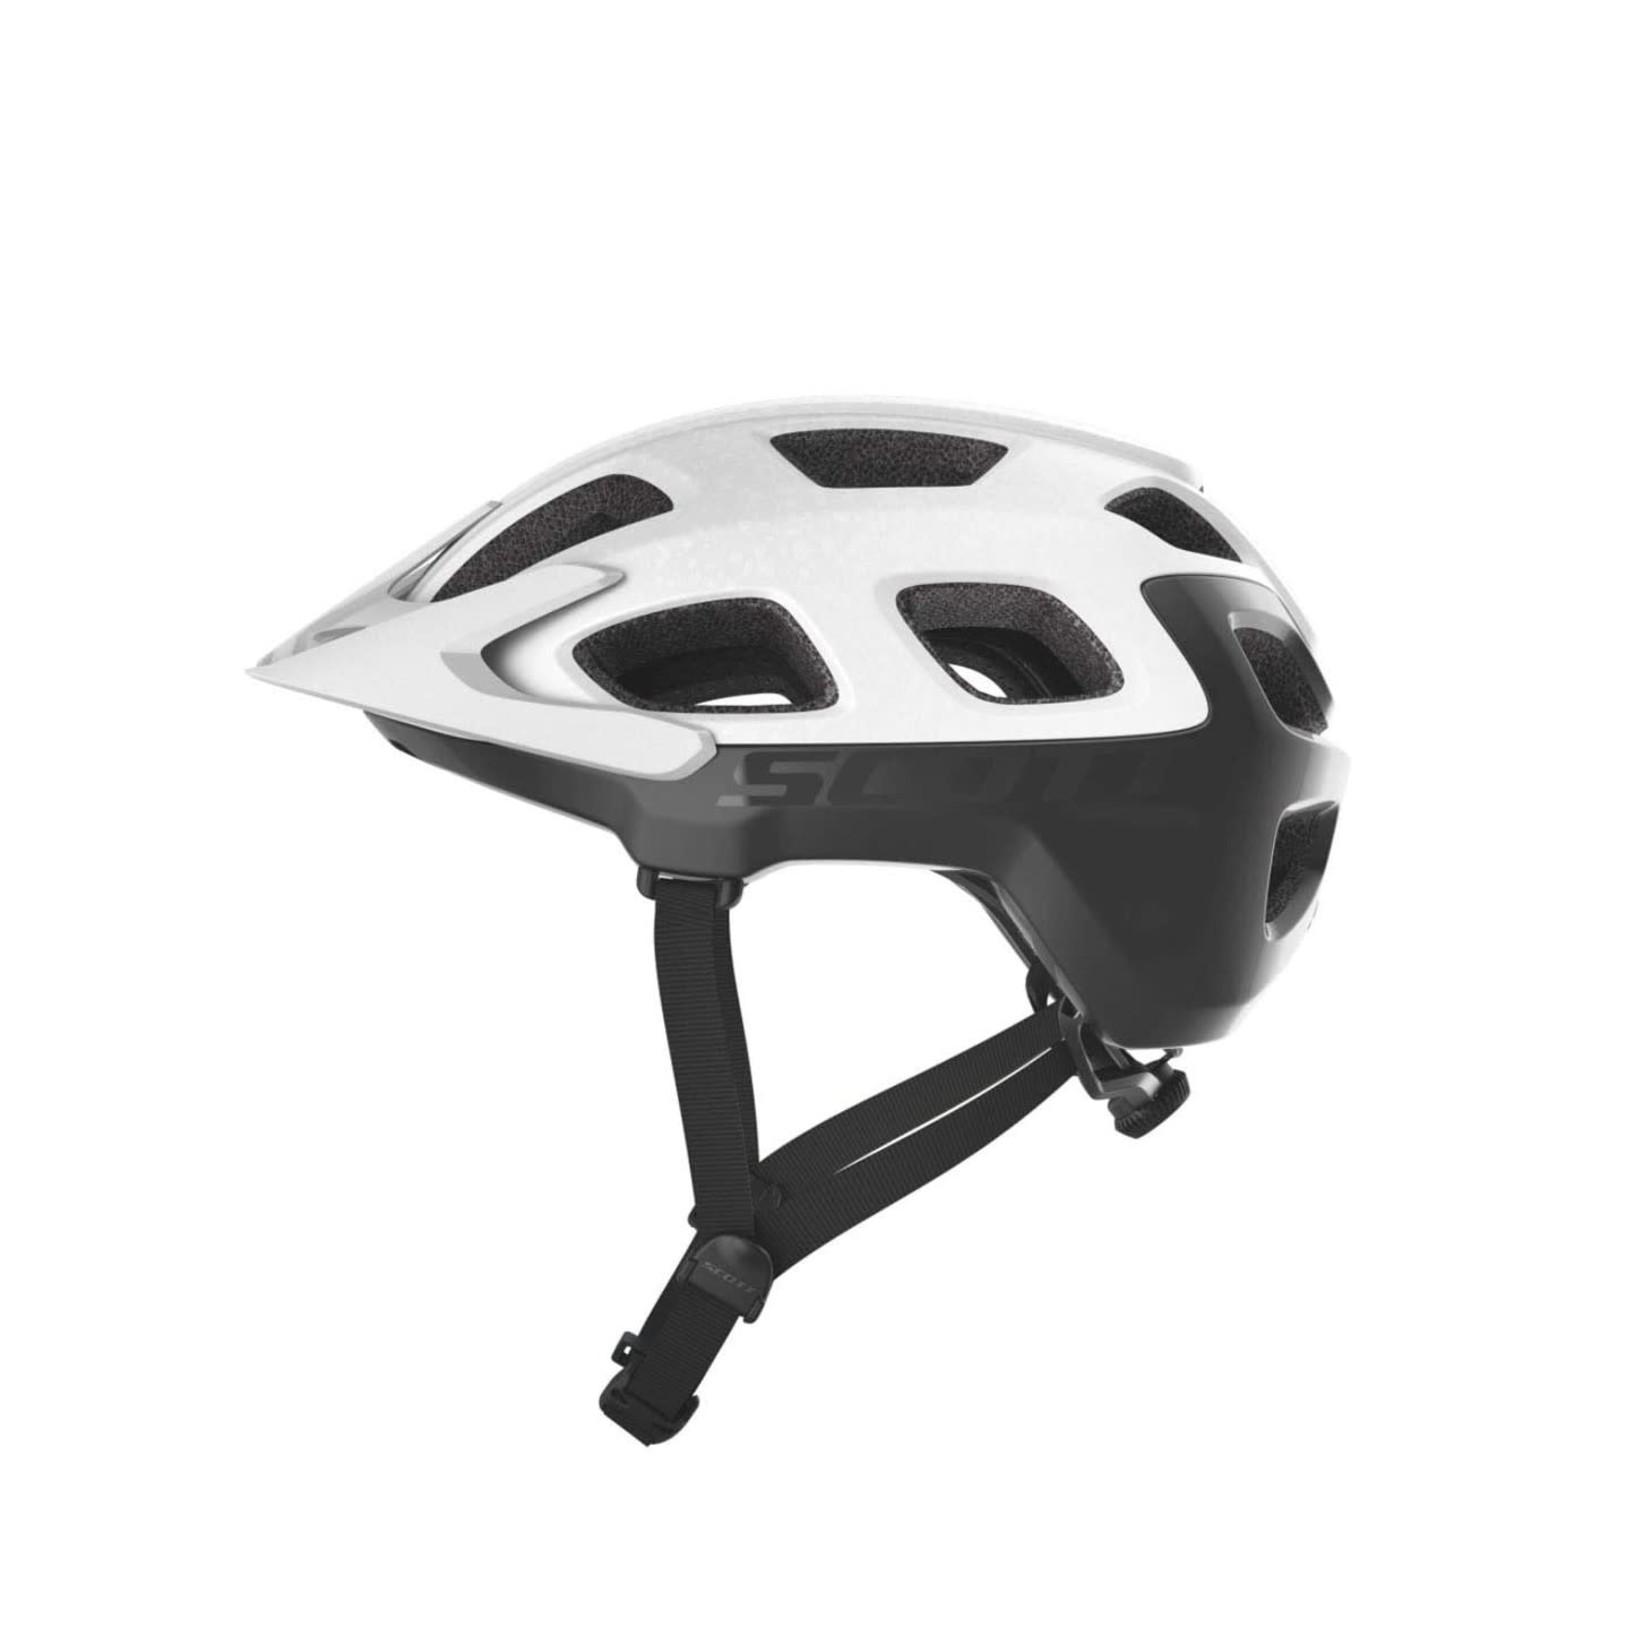 Scott Vivo Plus Helmet White/Black Large